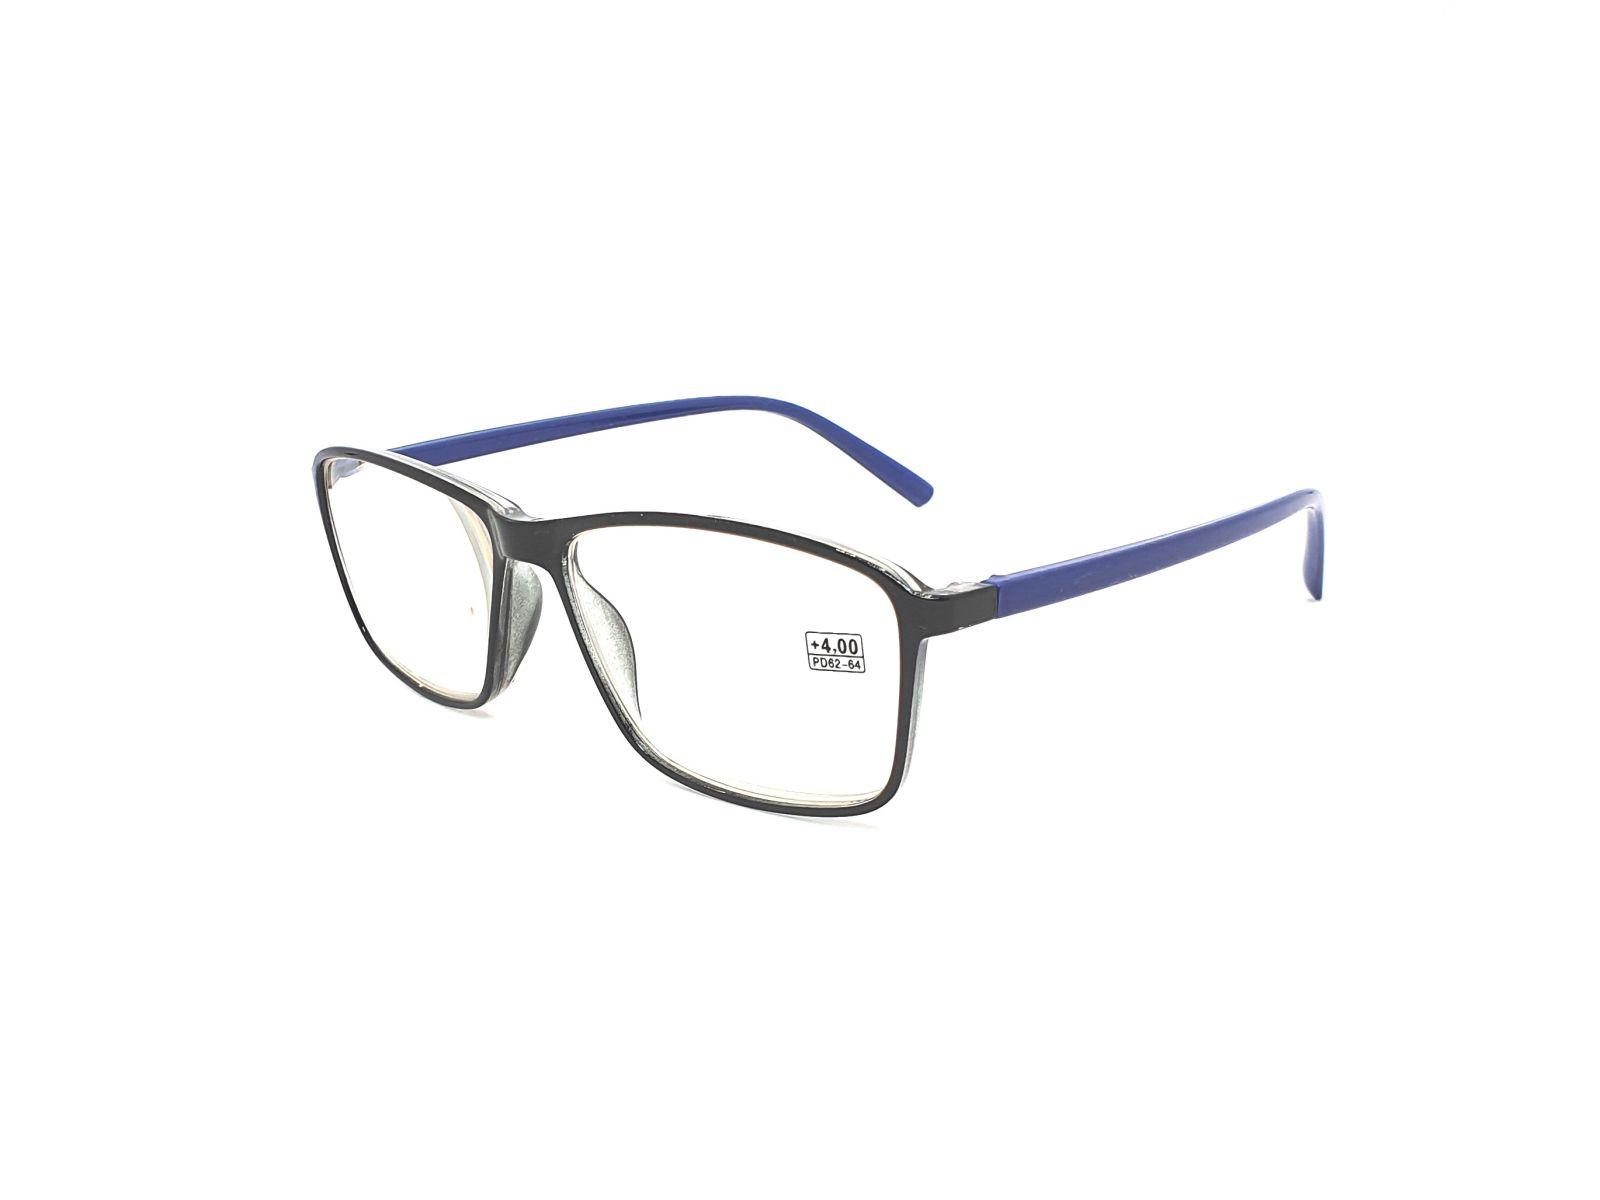 Dioptrické brýle 17218 / +3,00 blue